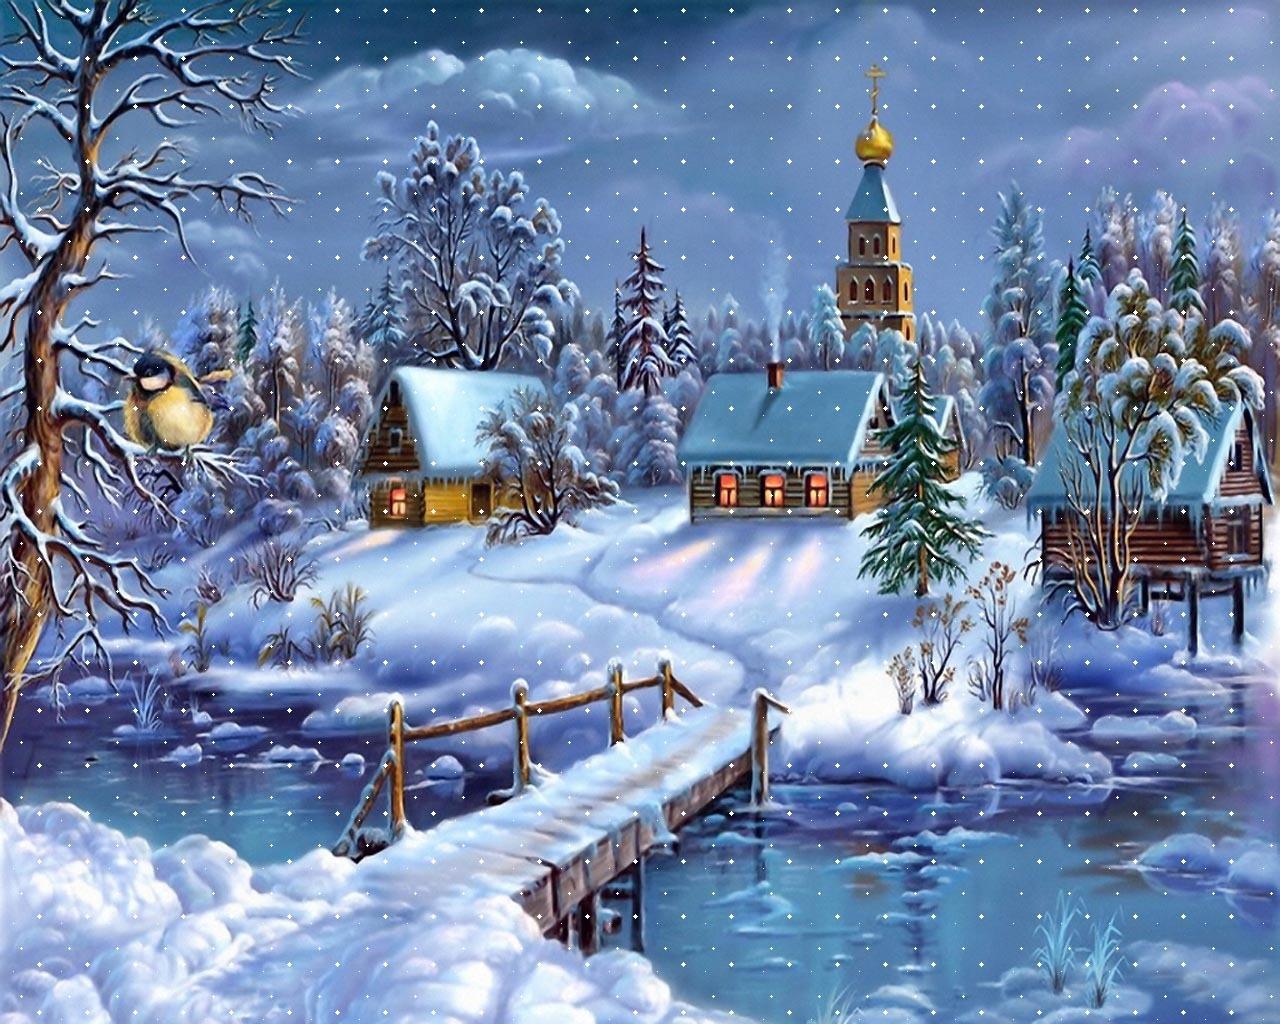 desktop wallpaper winter scenes - www.wallpapers-in-hd.com